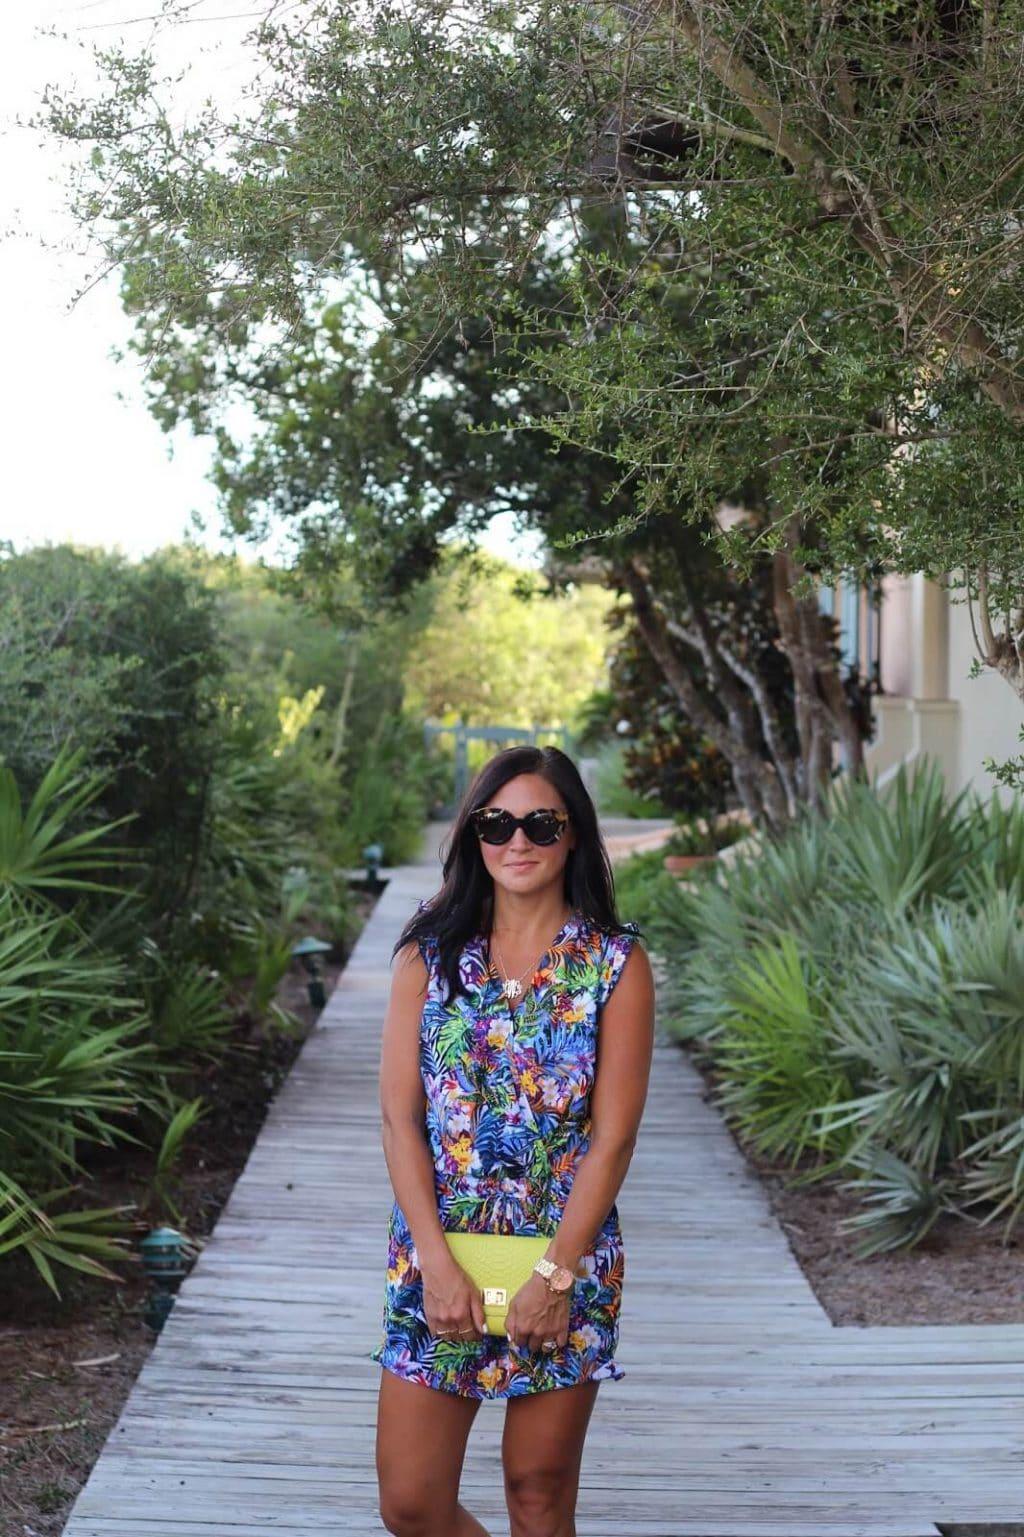 Blue Floral Romper, Rosemary Beach